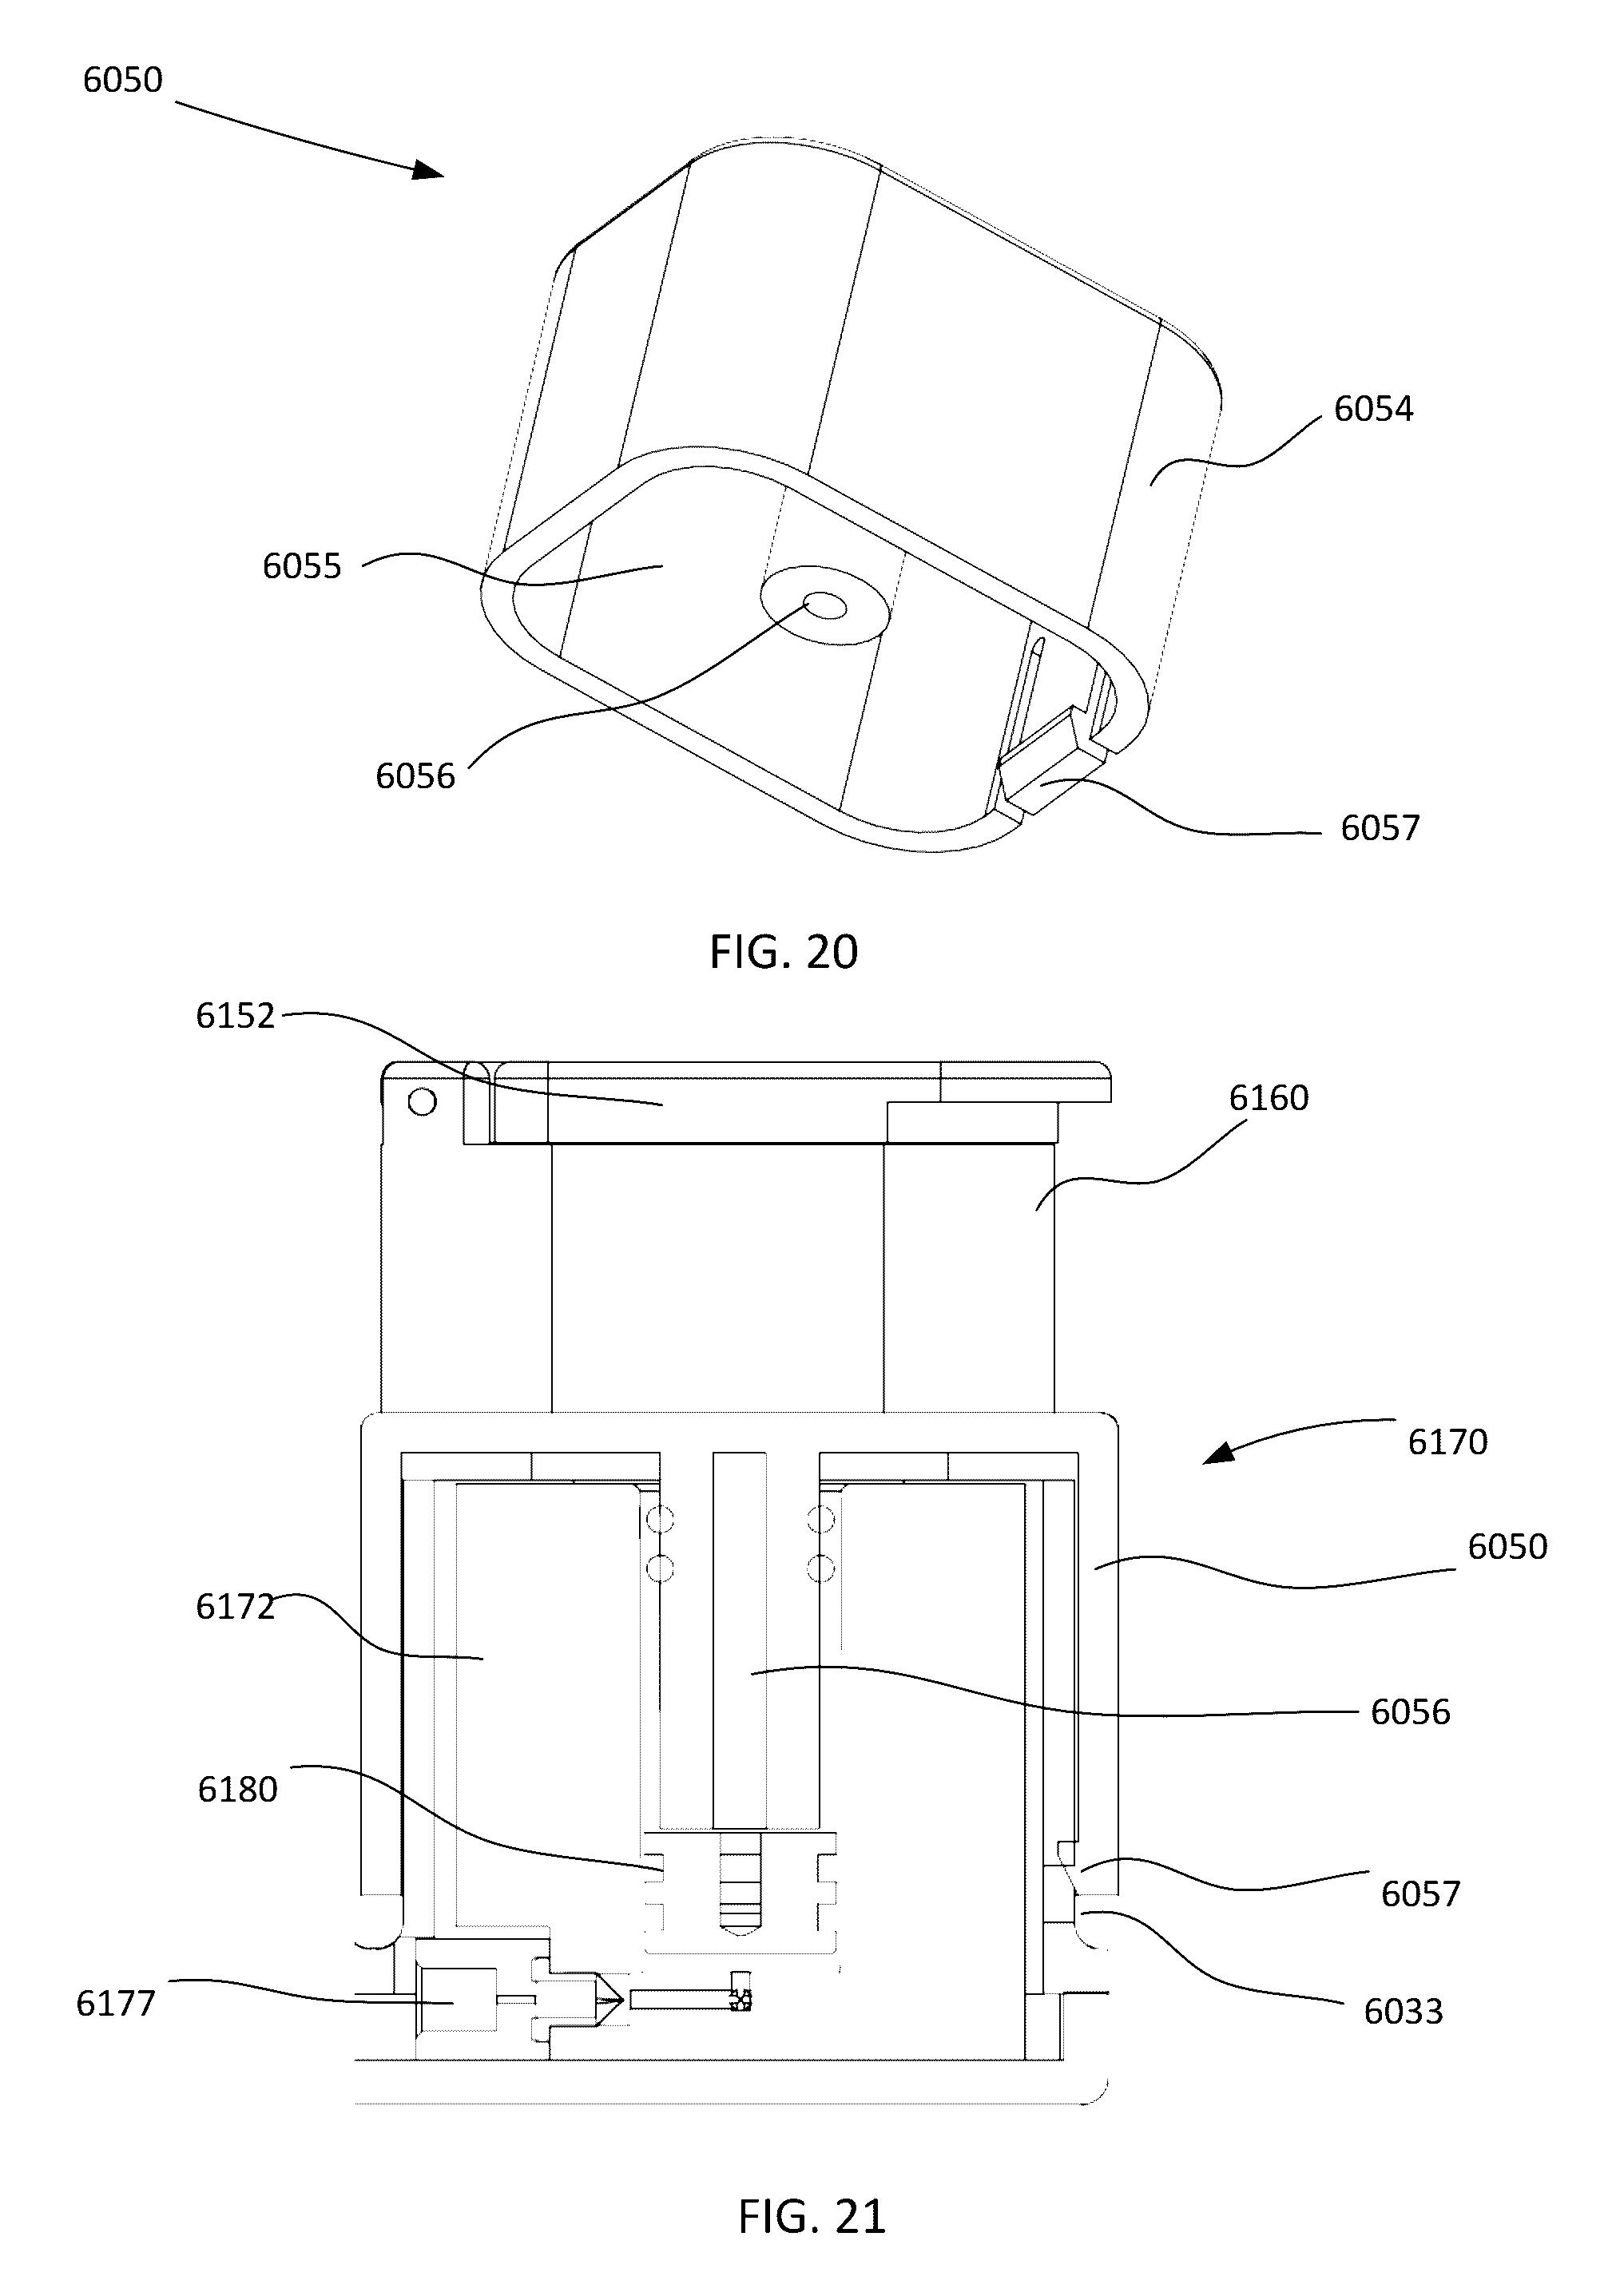 Patent US 9,623,415 B2